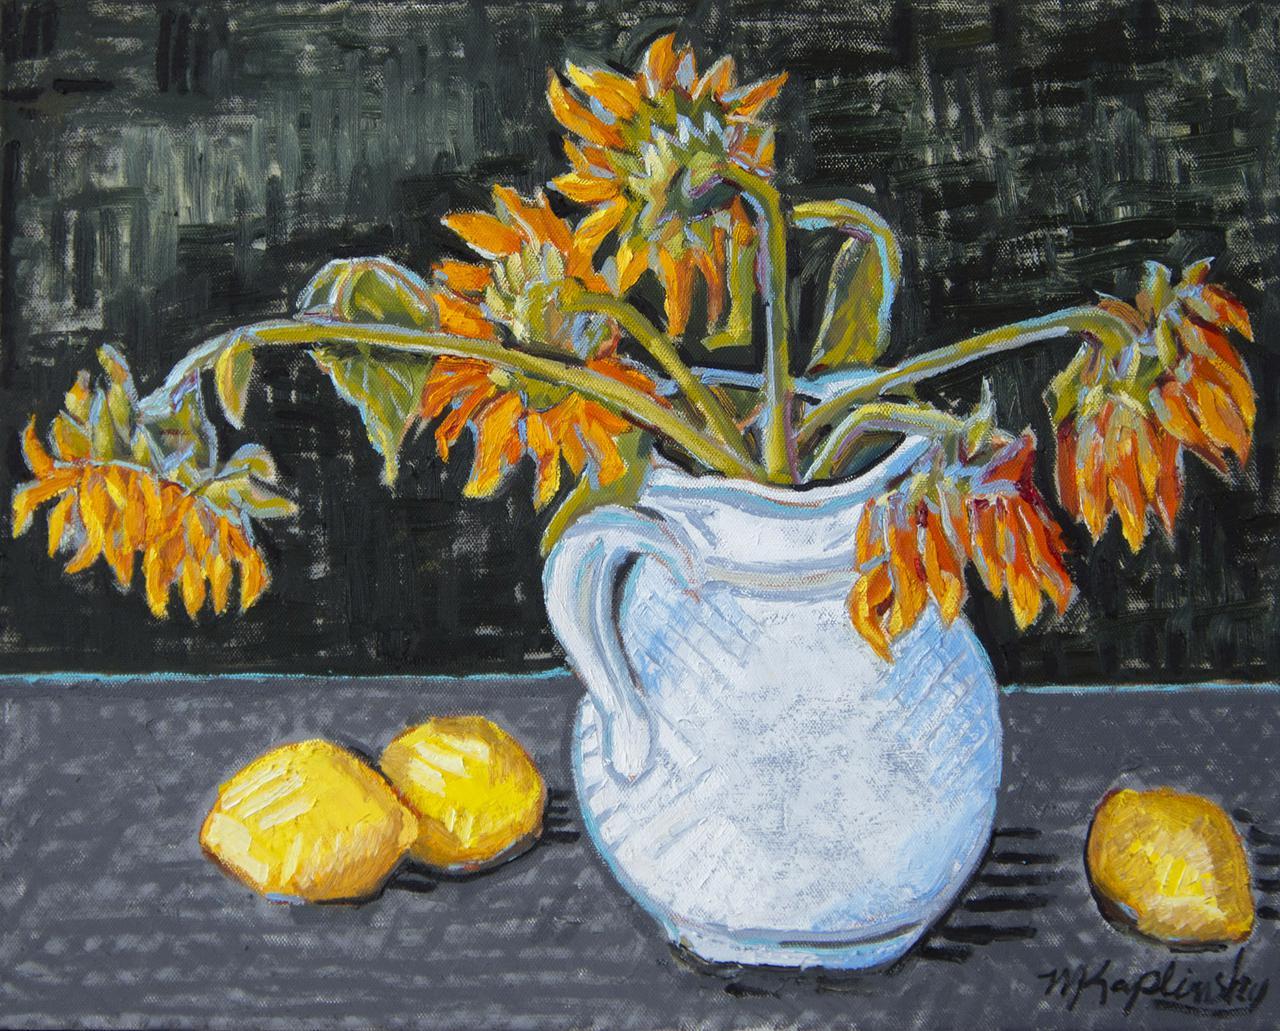 _dsc2243 sunflowers and lemons 16x20 inches oilon canvas by matt kaplinskky_web.jpg